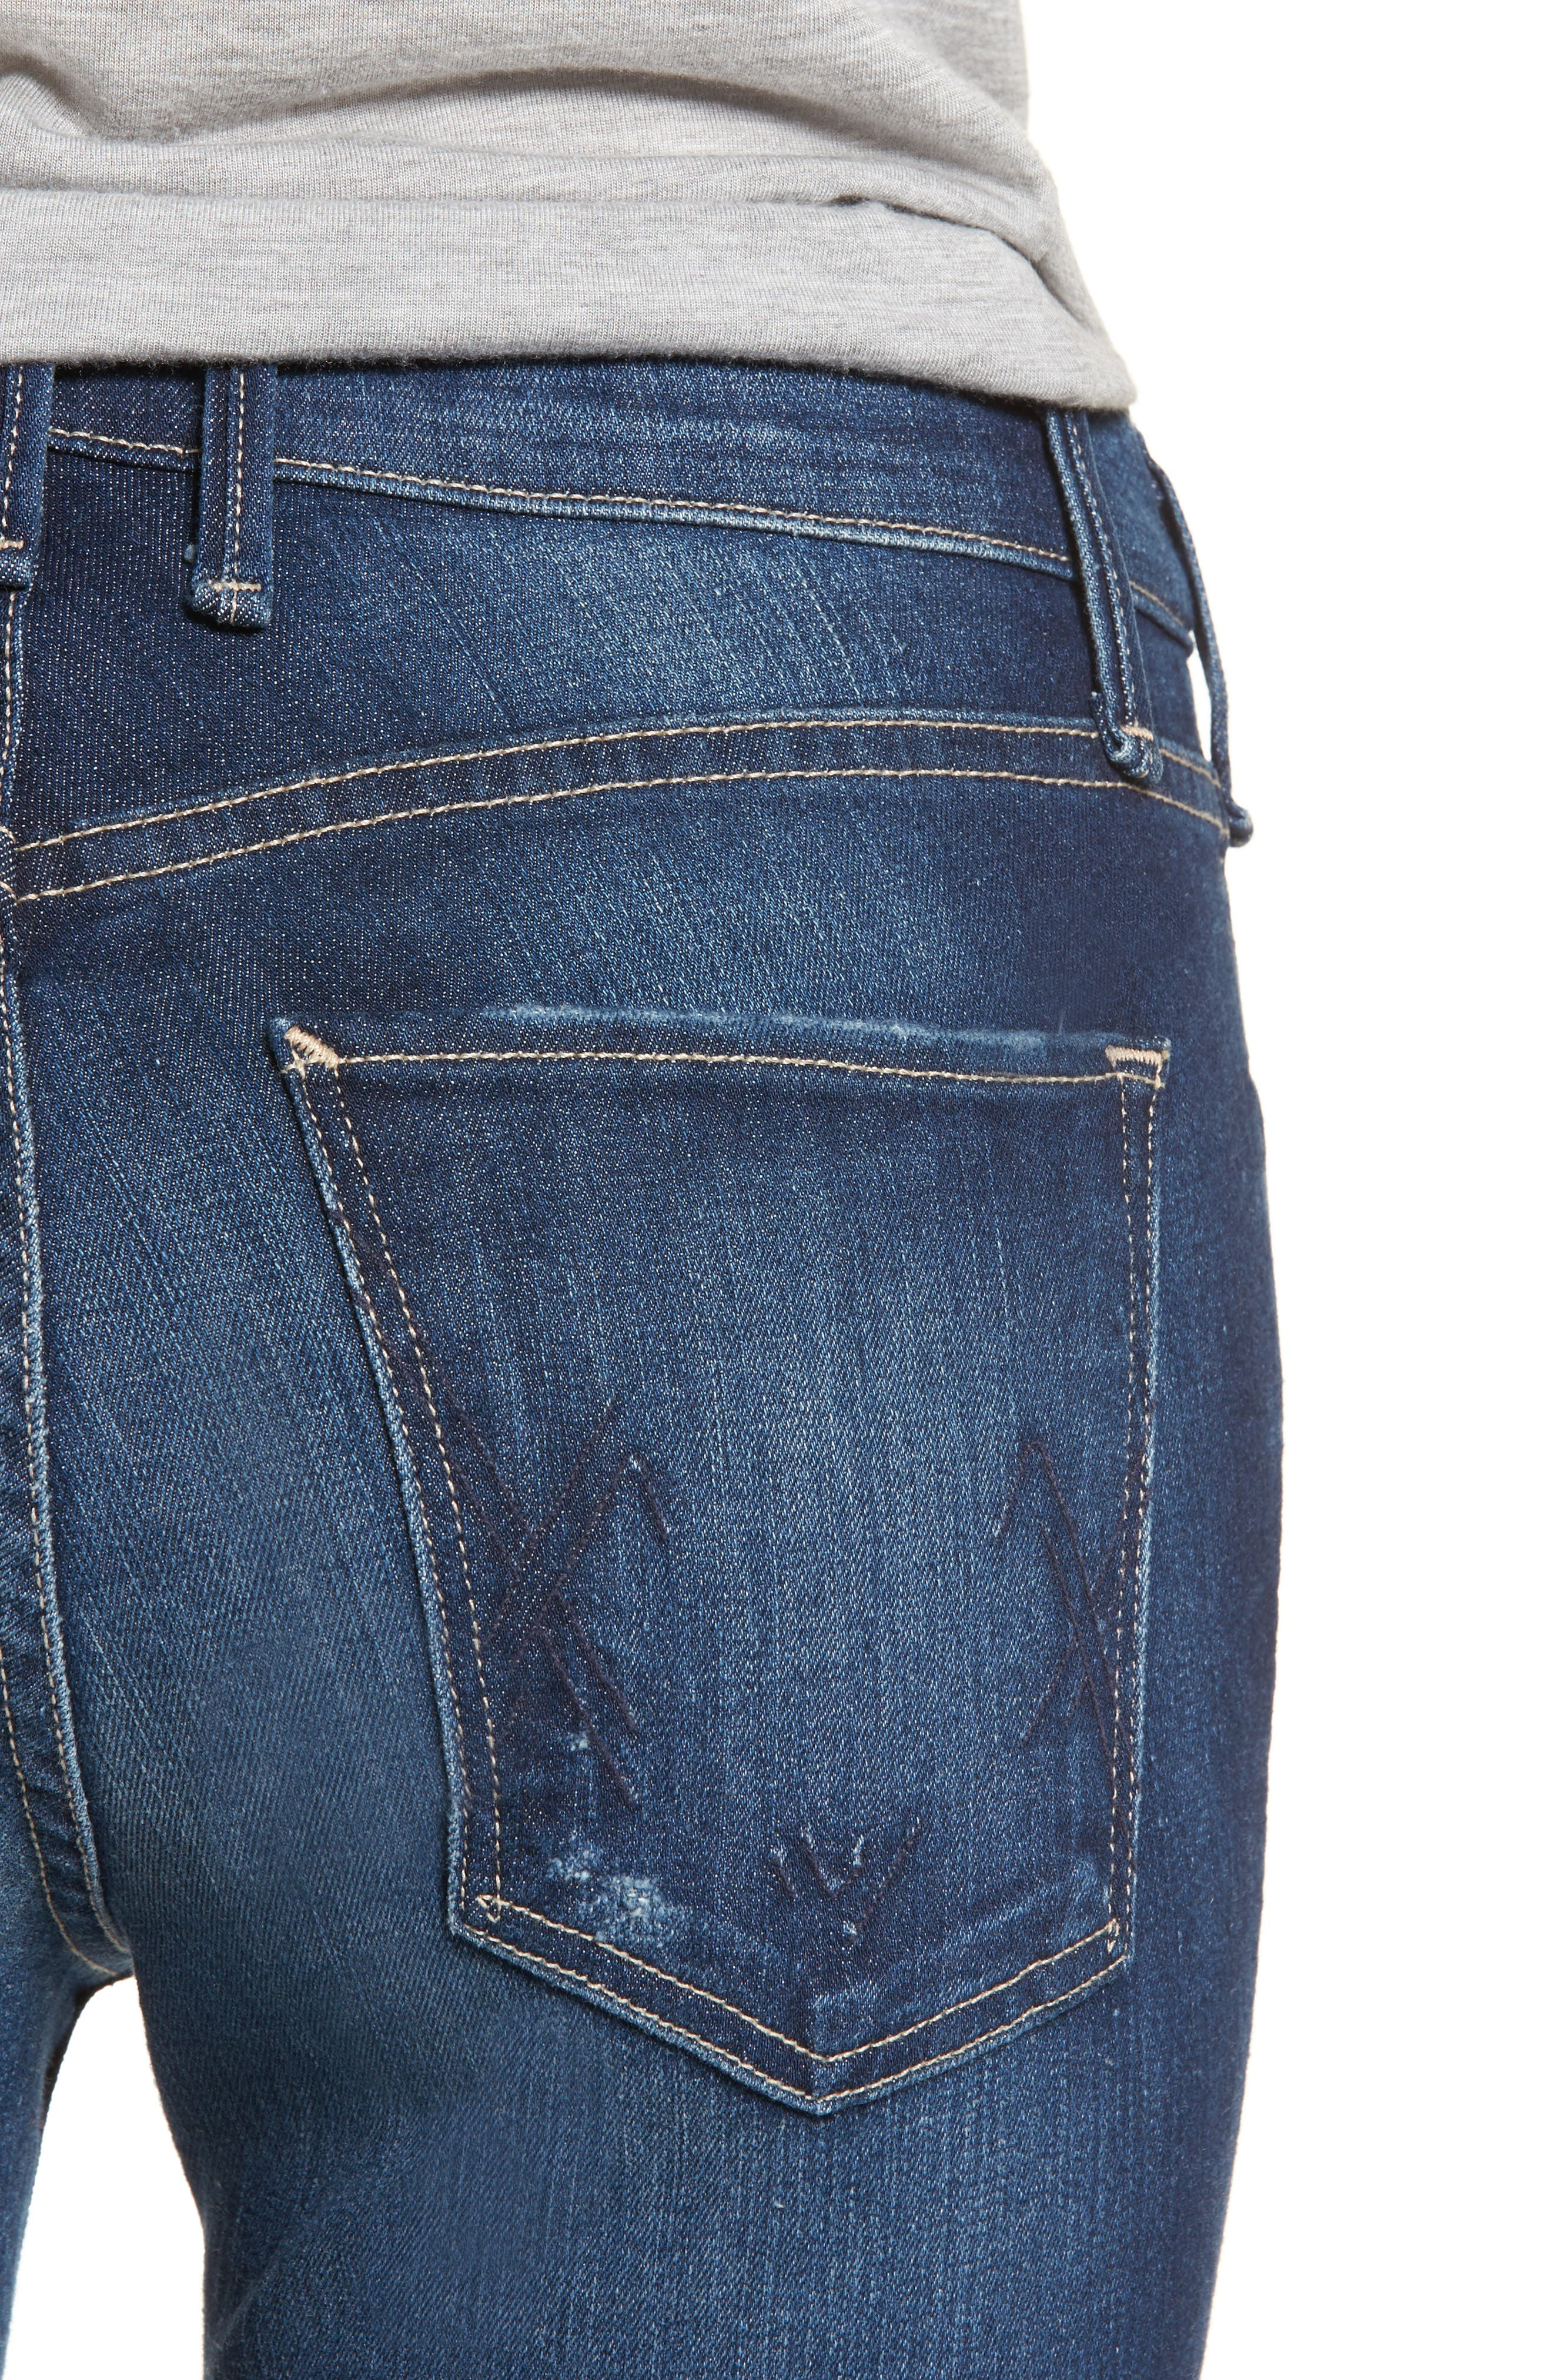 Newton Skinny Jeans,                             Alternate thumbnail 4, color,                             Chateau